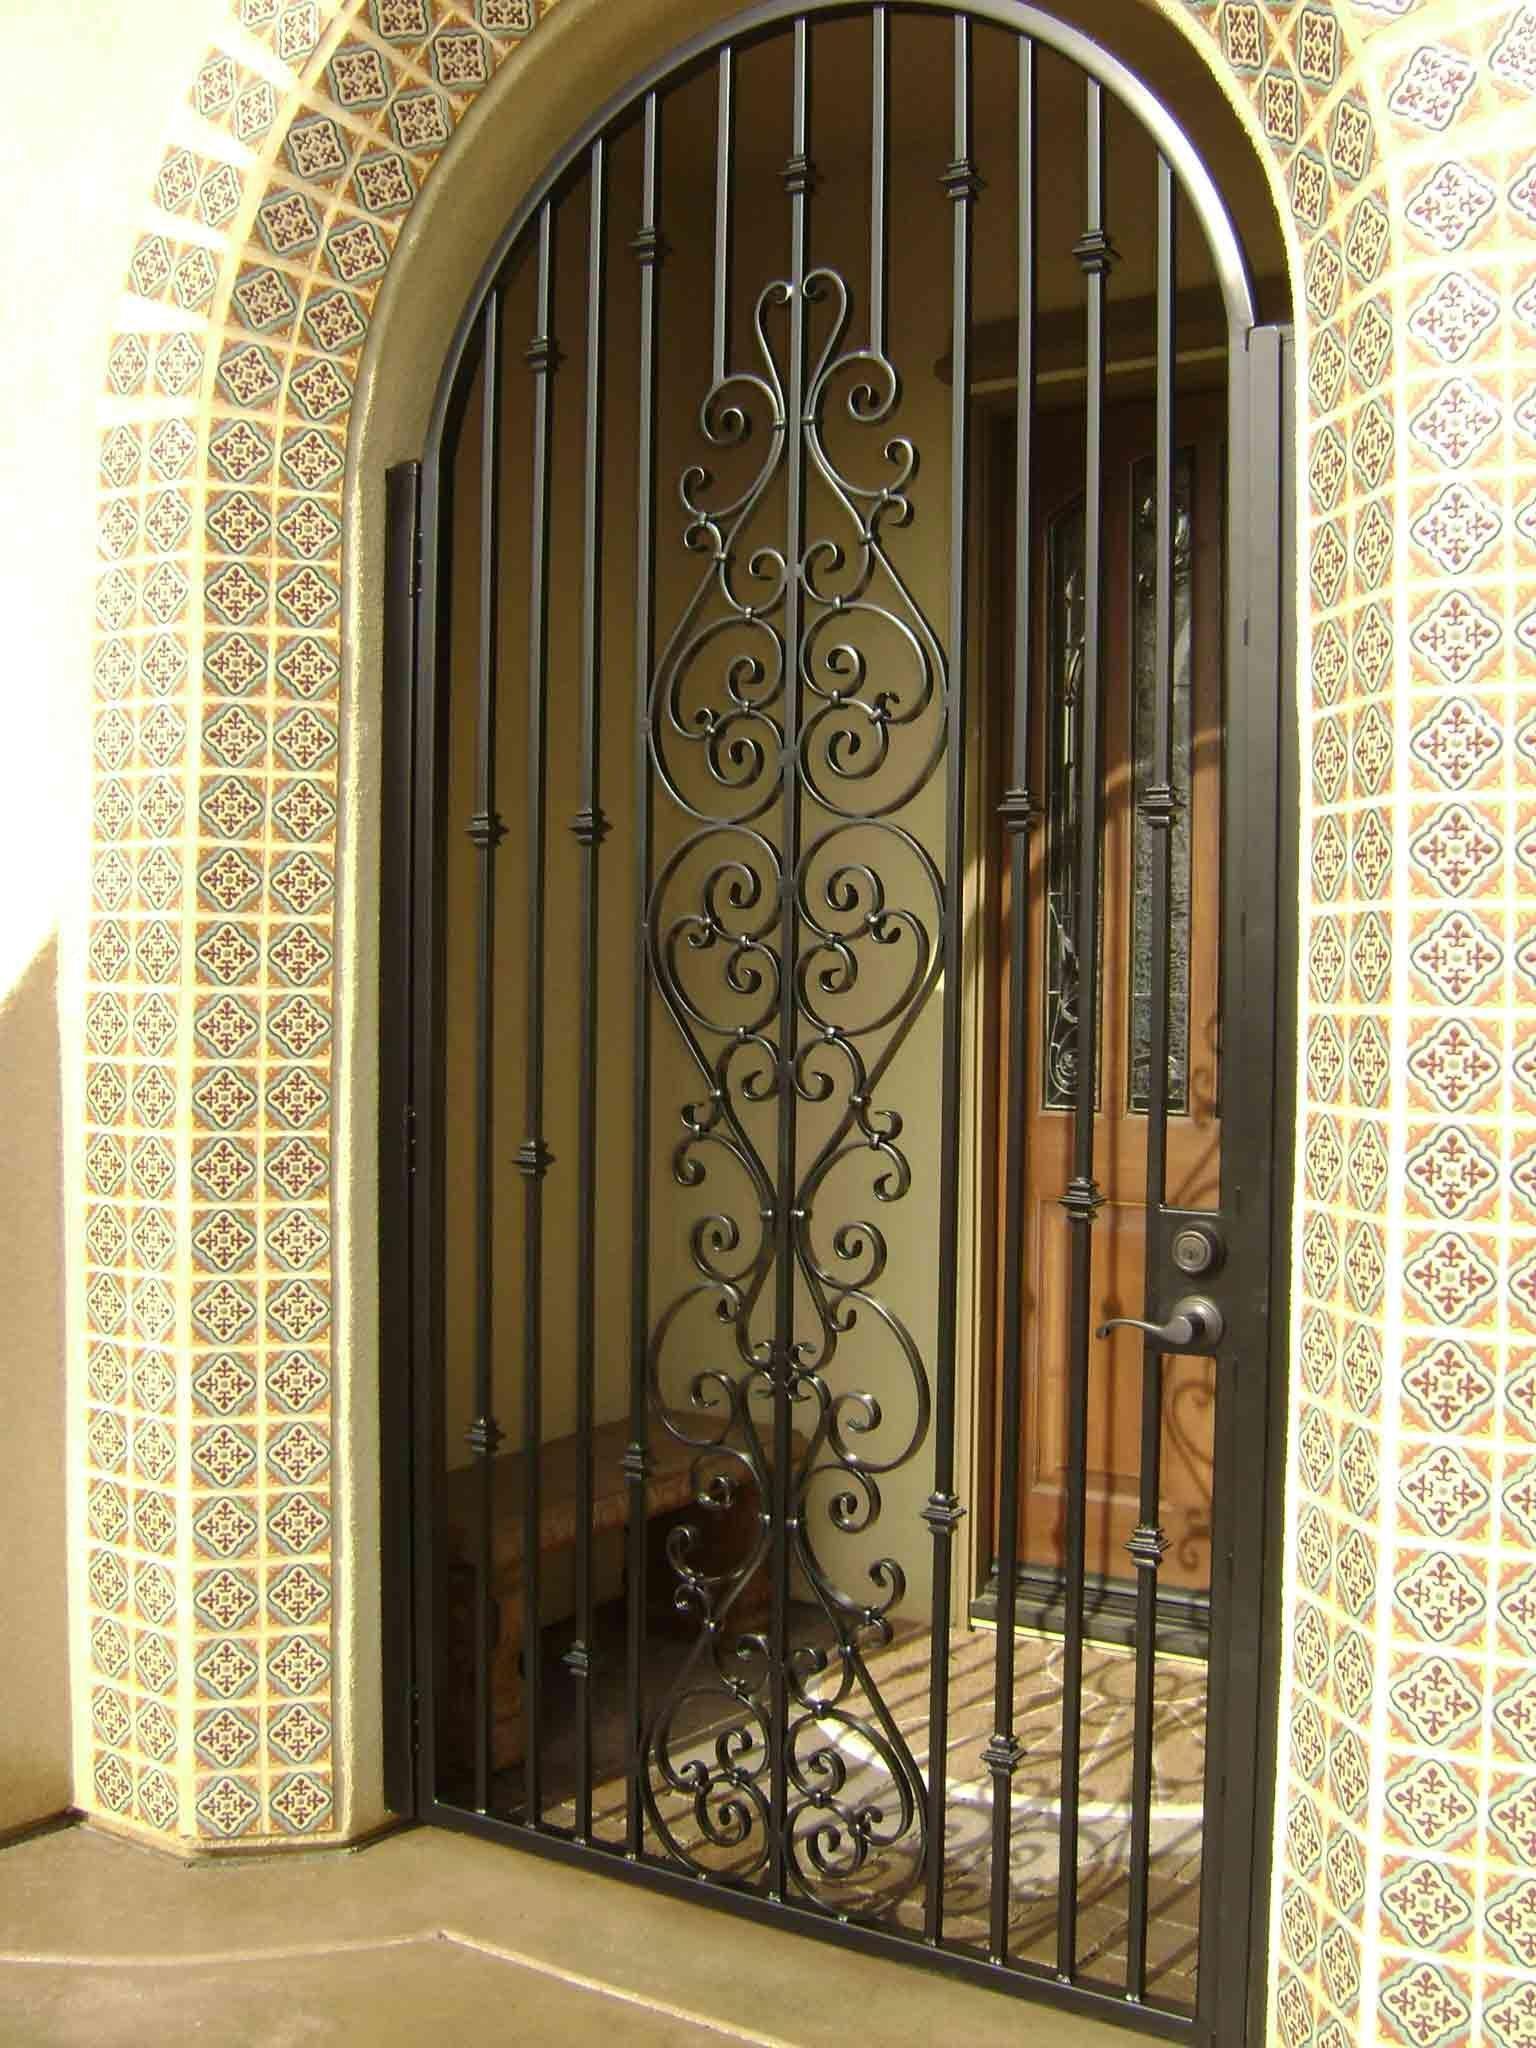 Security Bars For Front Door Window | http://thewrightstuff.us ...